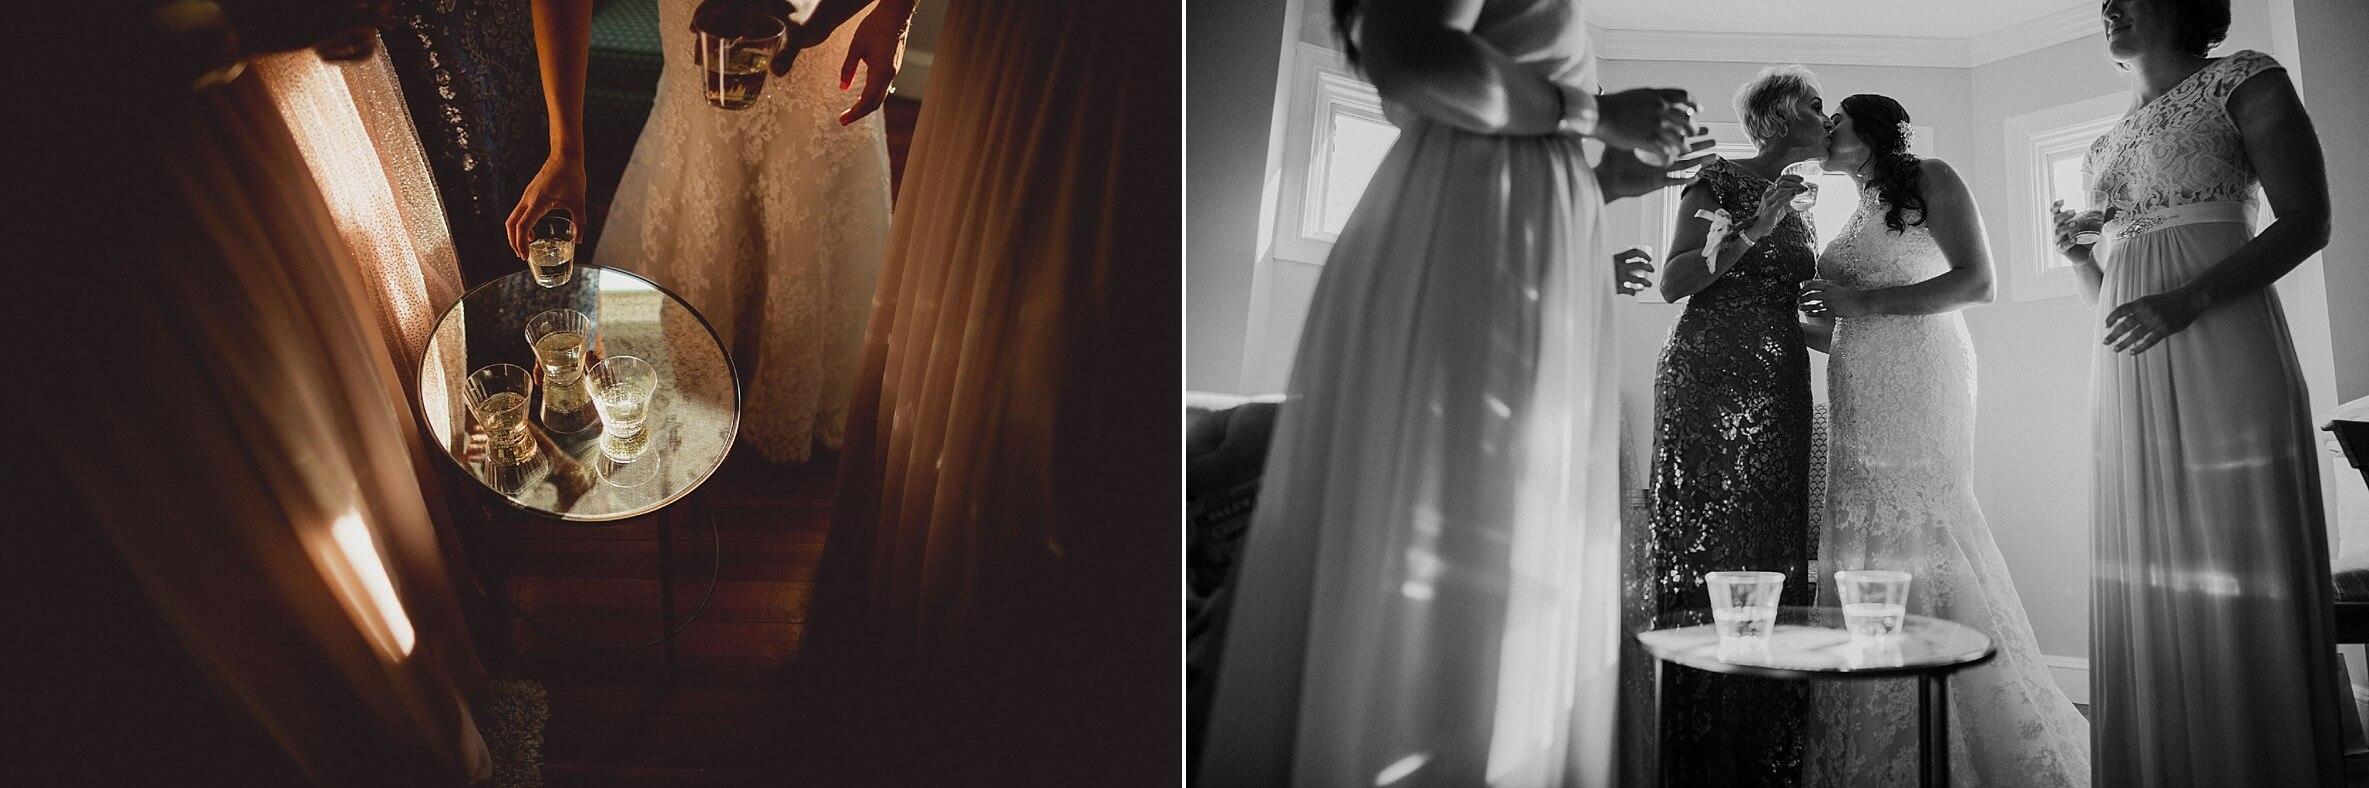 Hellenic Center Wedding-52.jpg